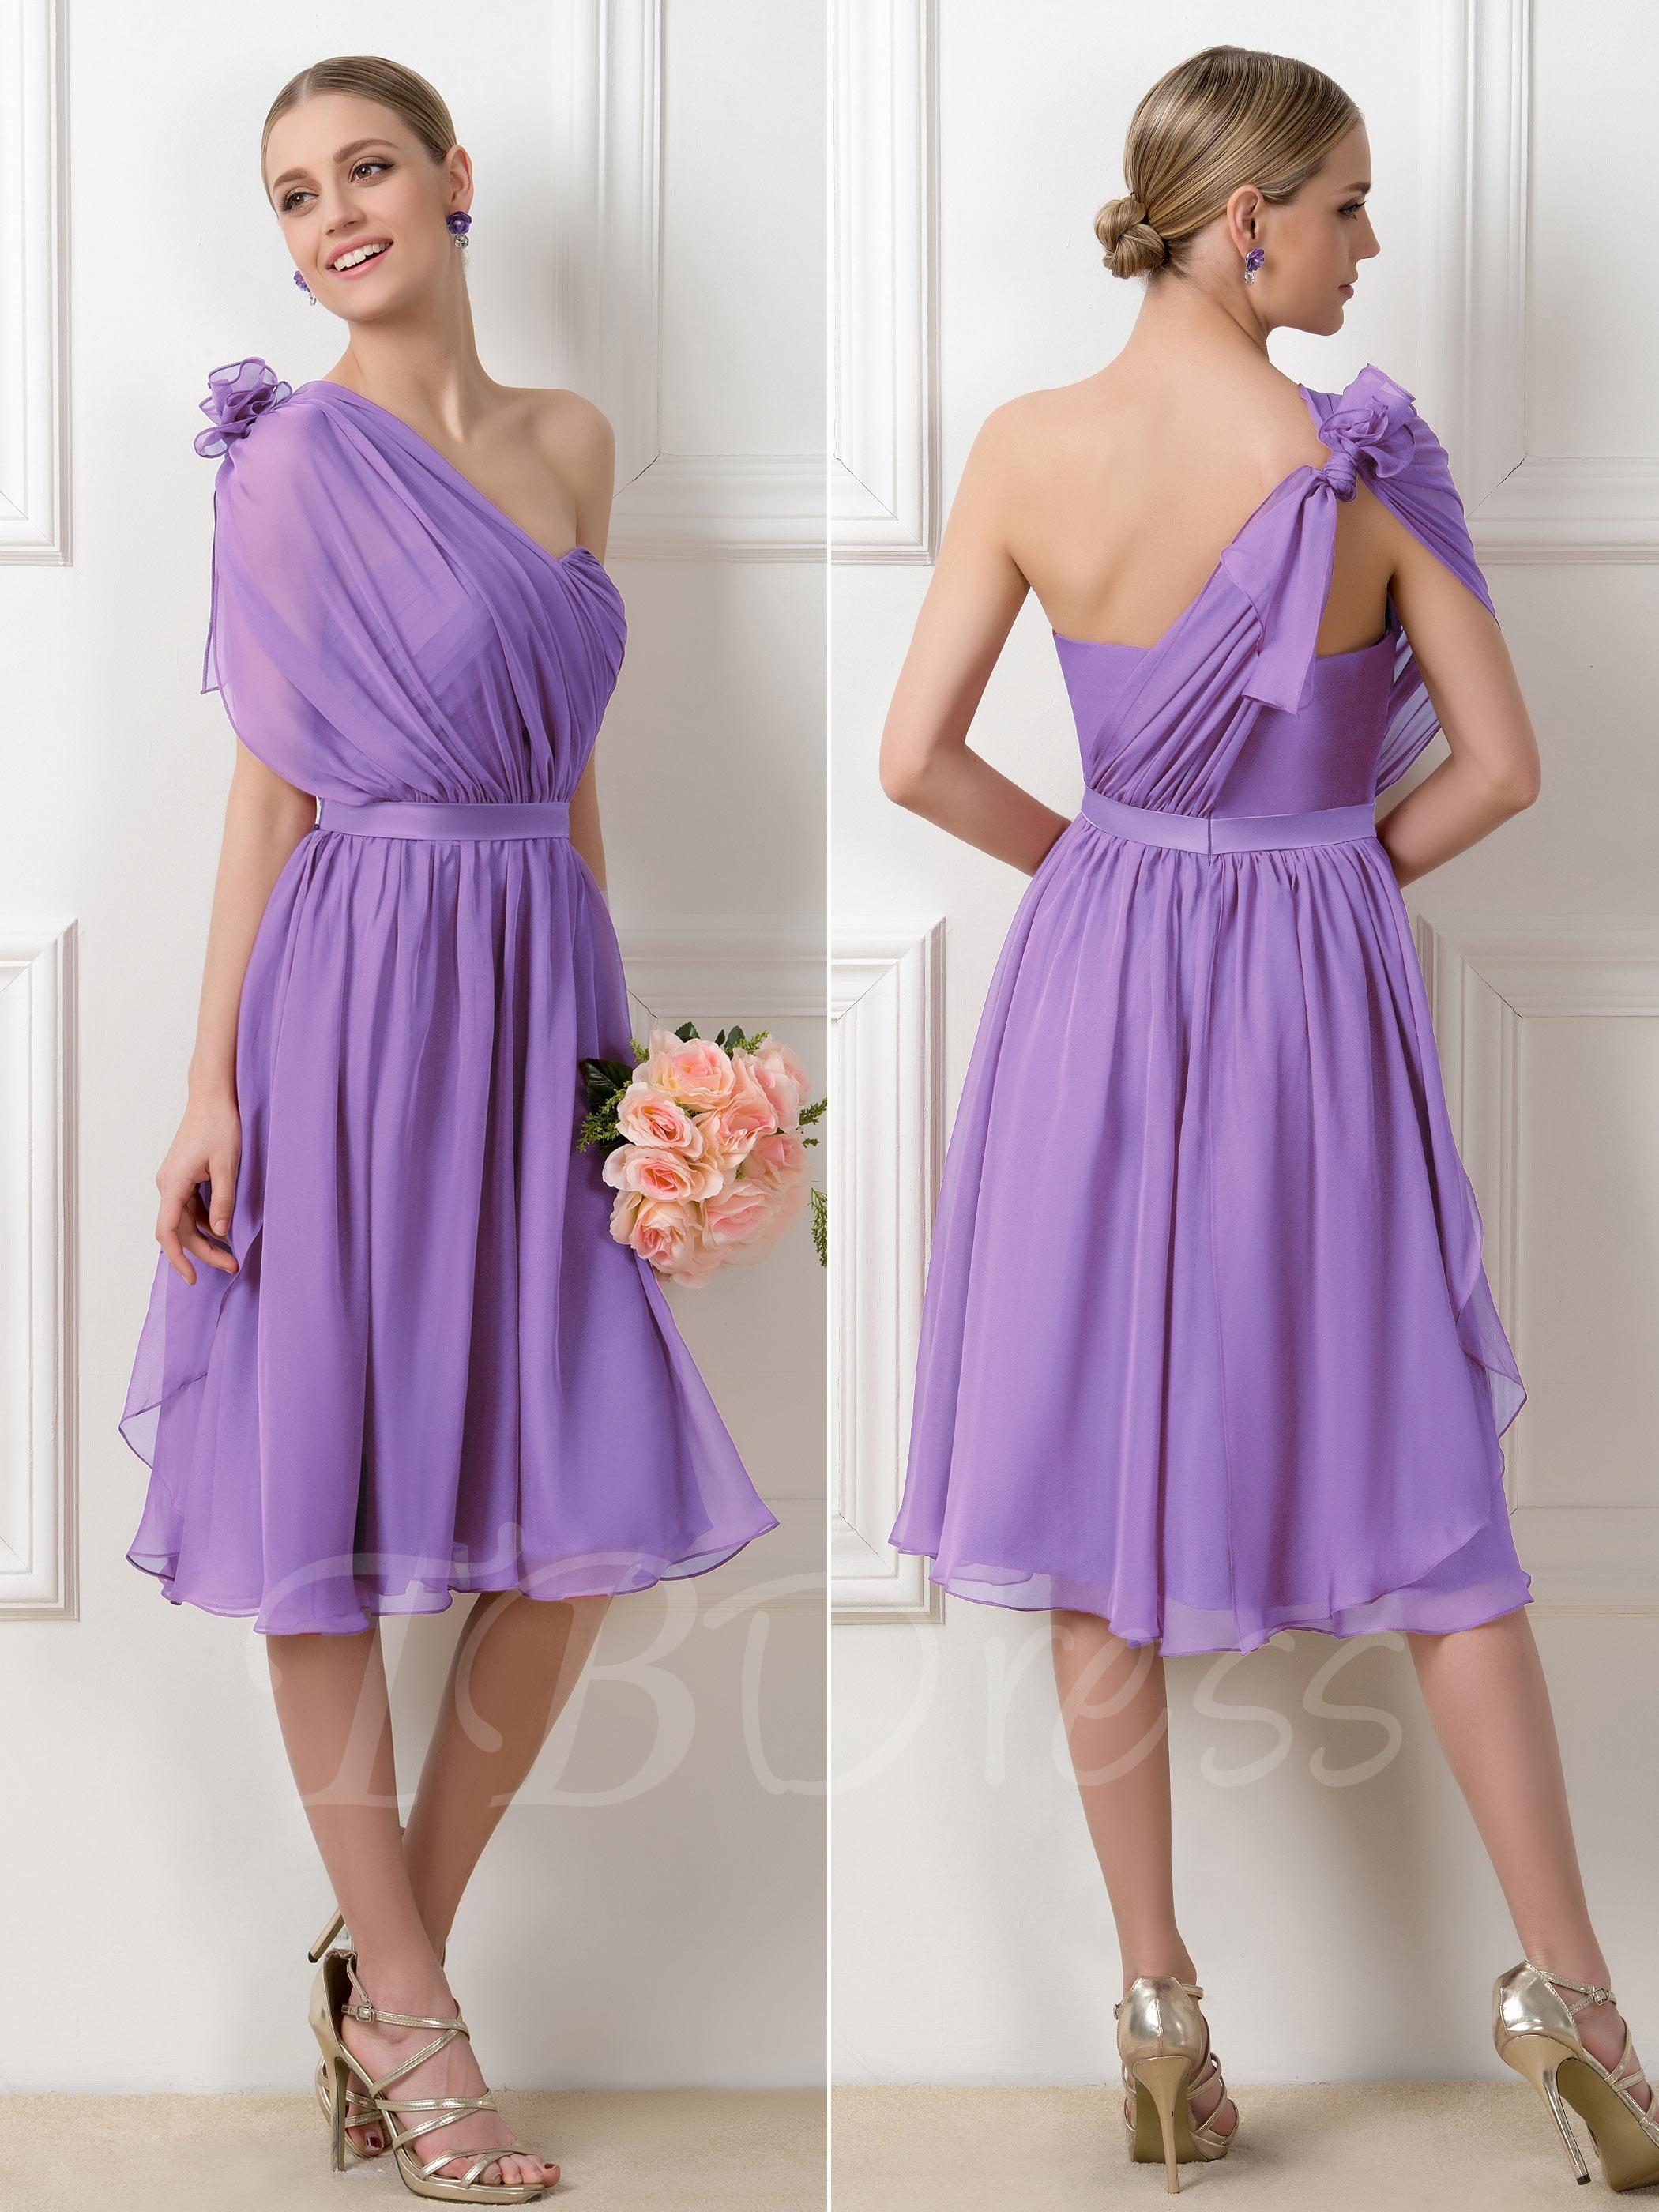 2f863b7727a0 W248 Romantic Purple Convertible A-Line Knee-Length Short Bridesmaid Dress